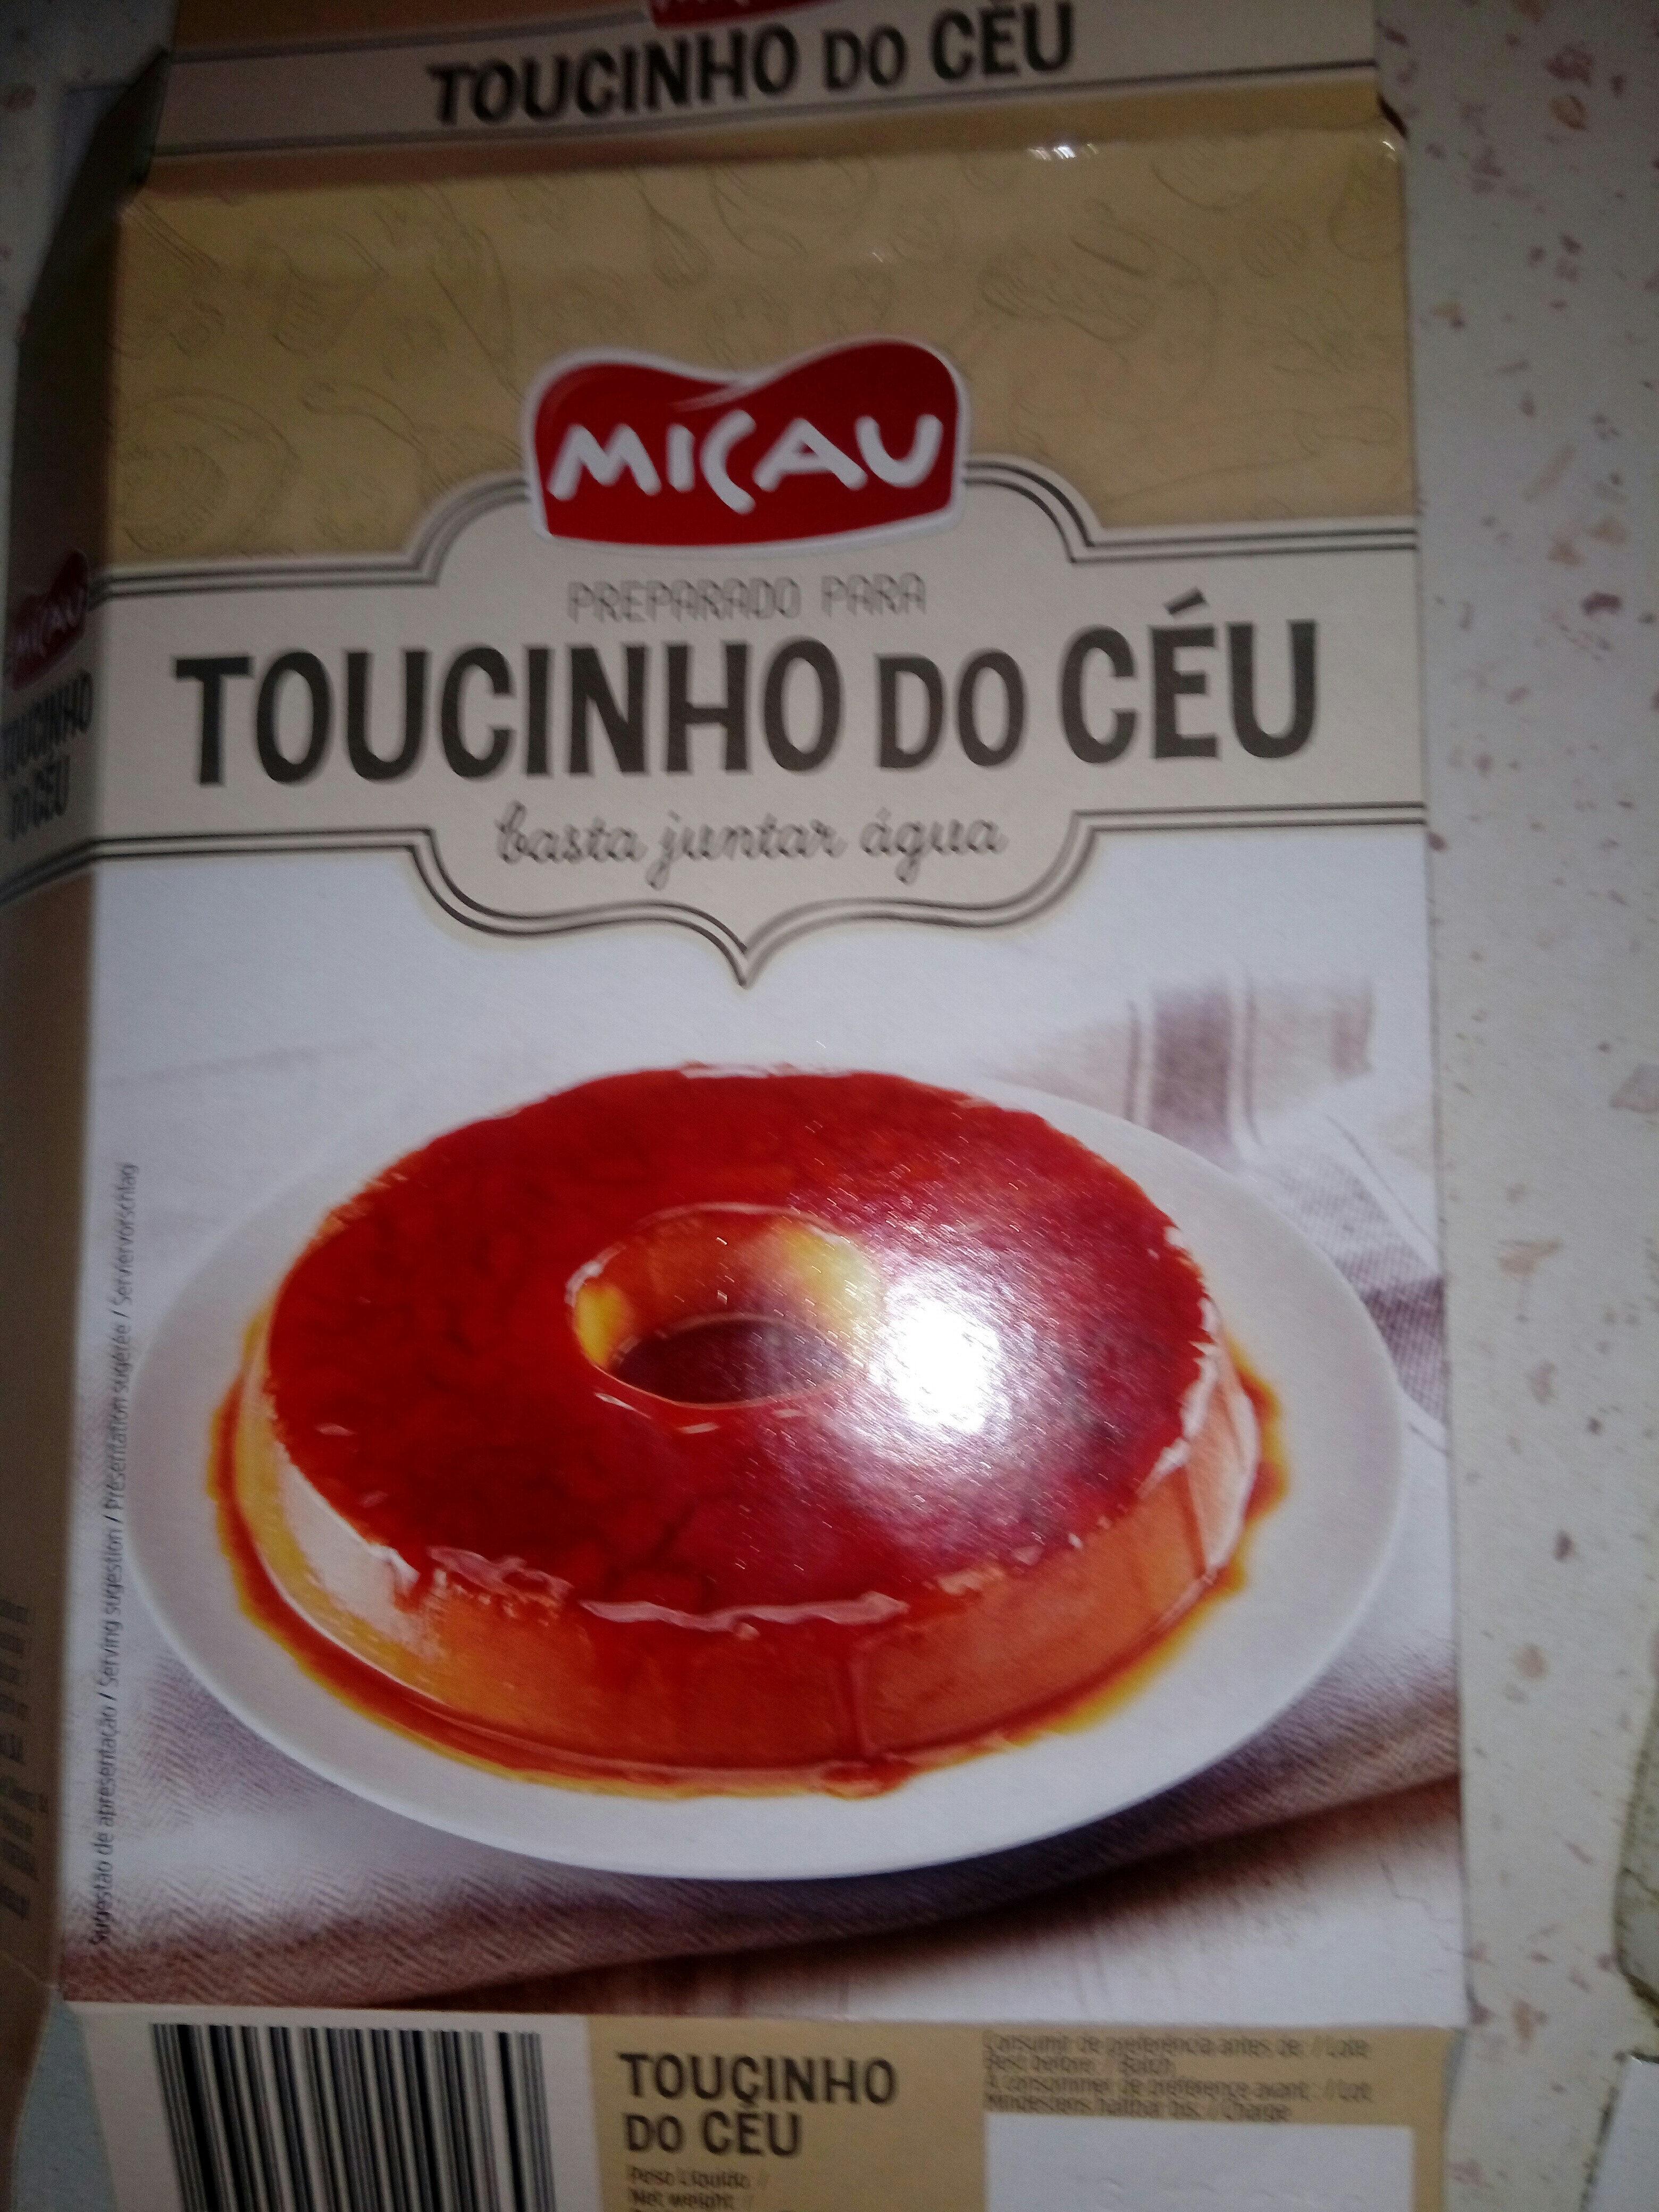 Micau Pudim Touchino Do Ceu 230G - Product